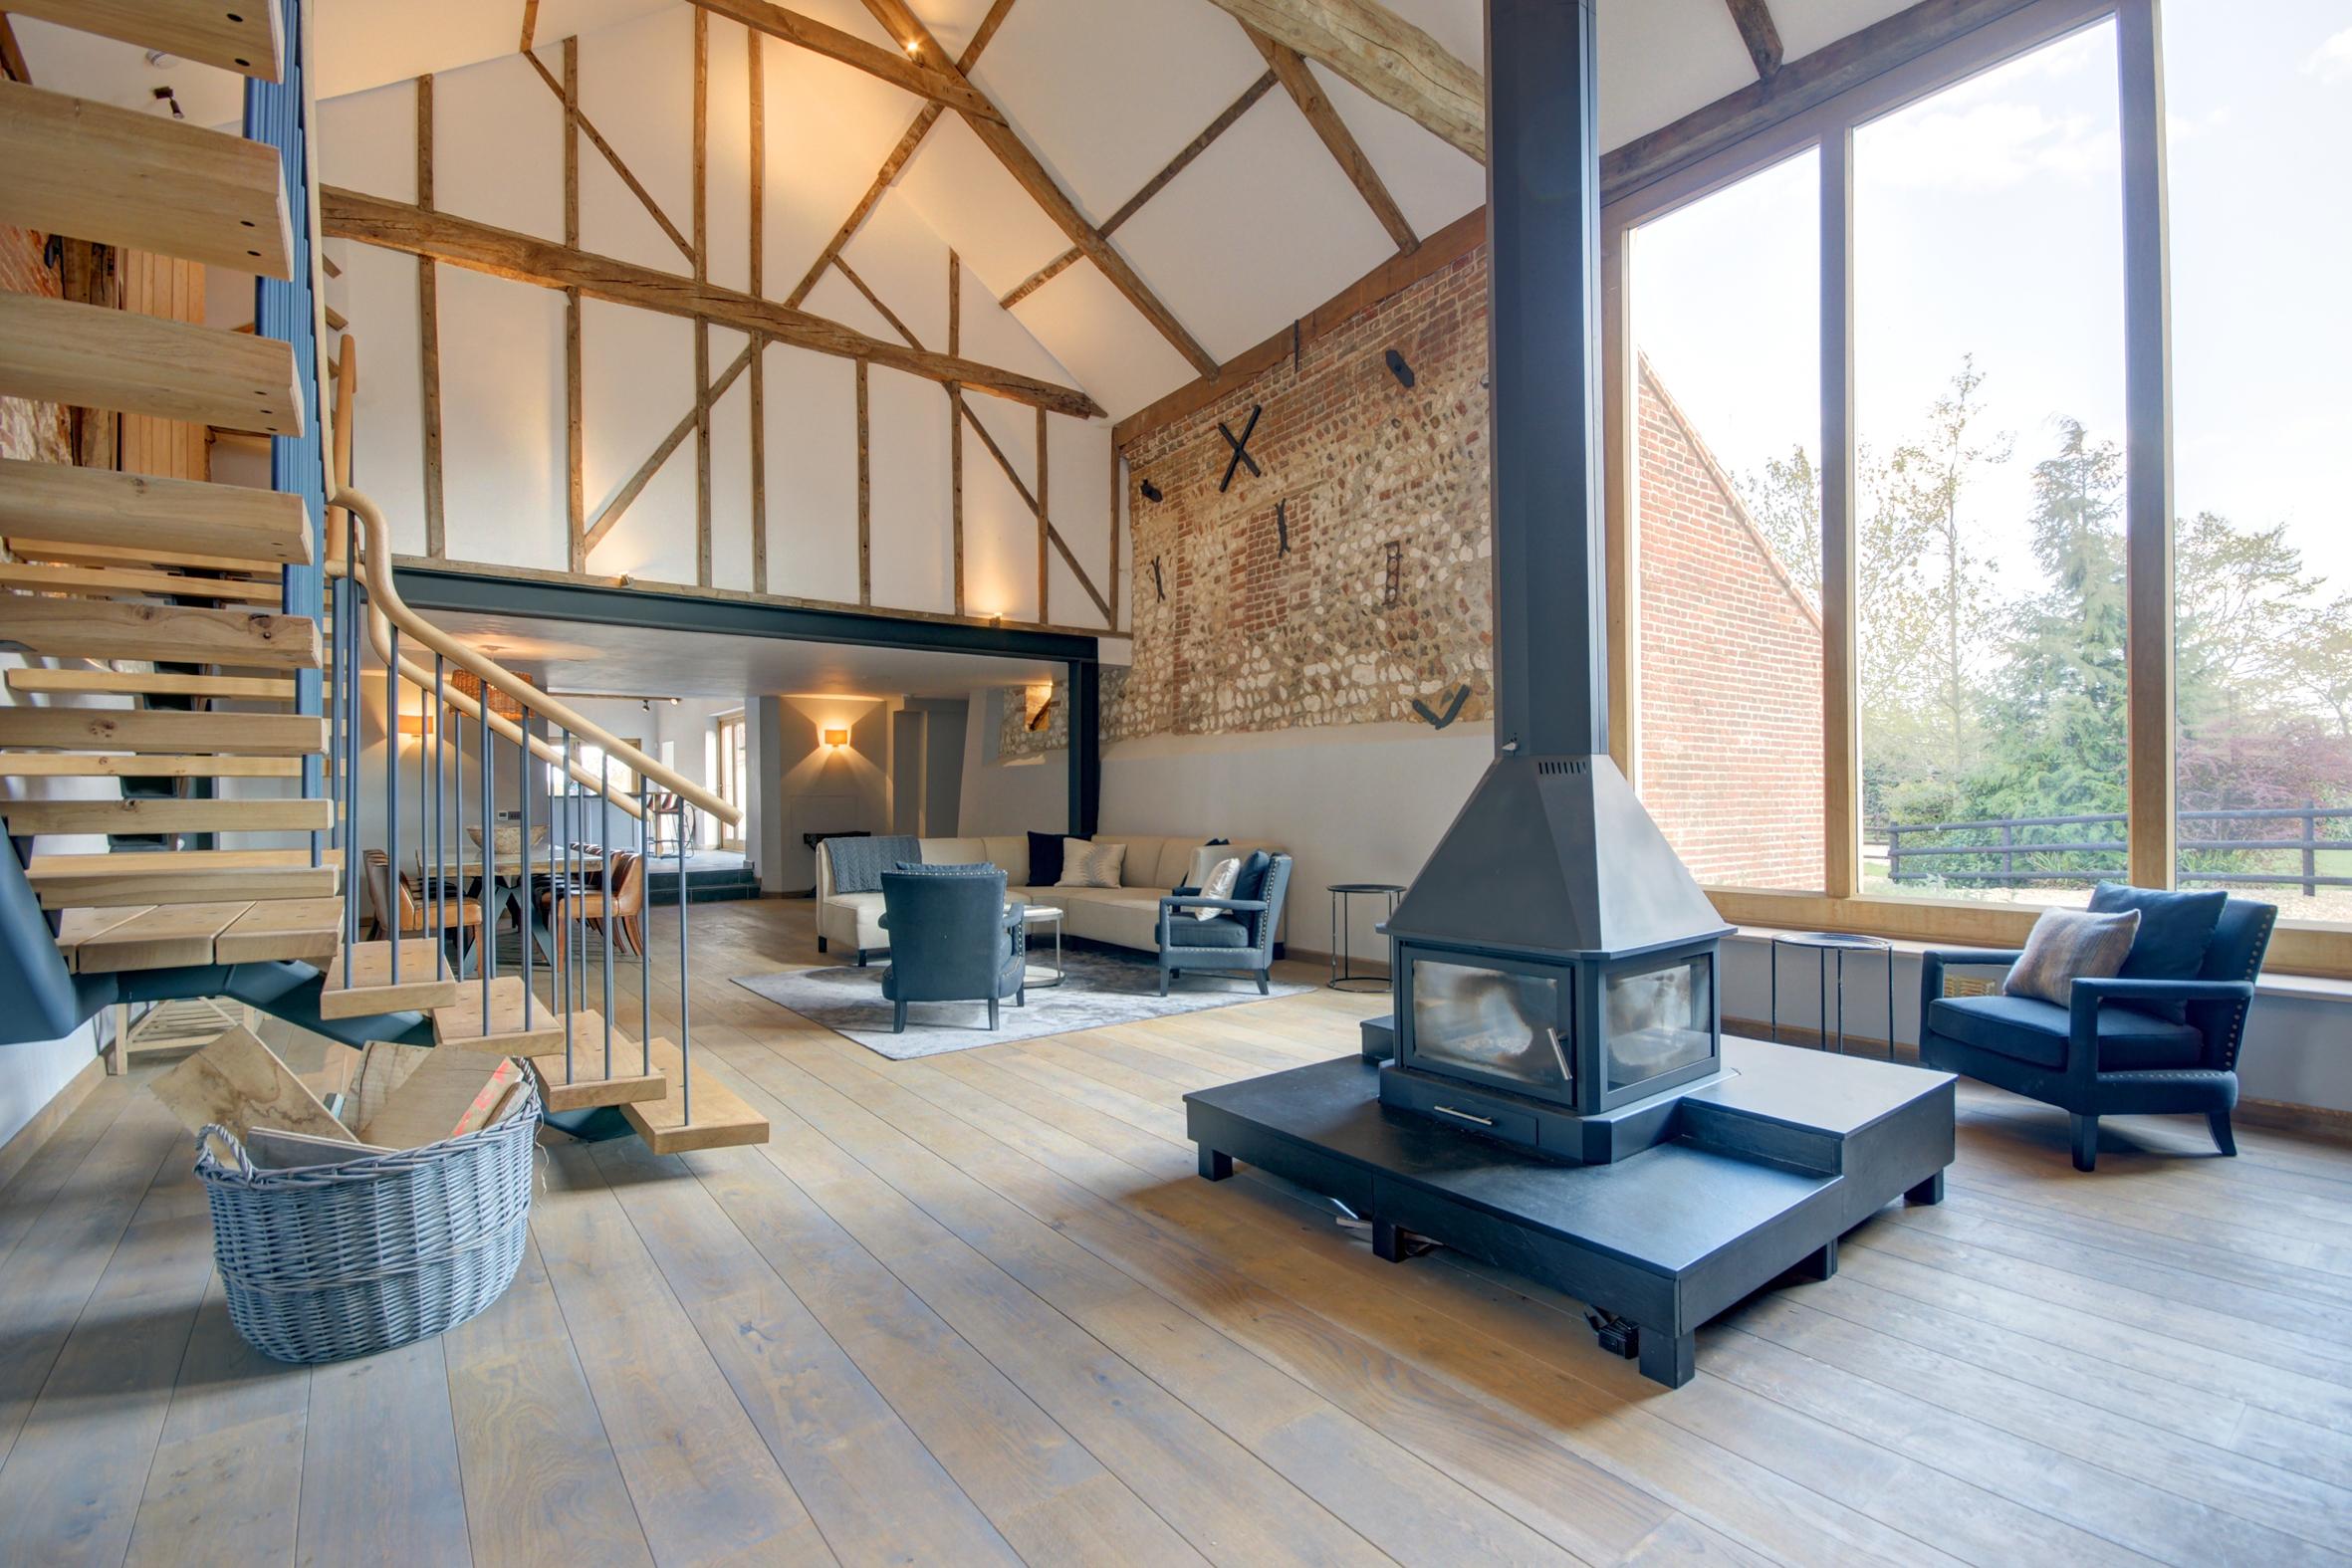 London Design Group